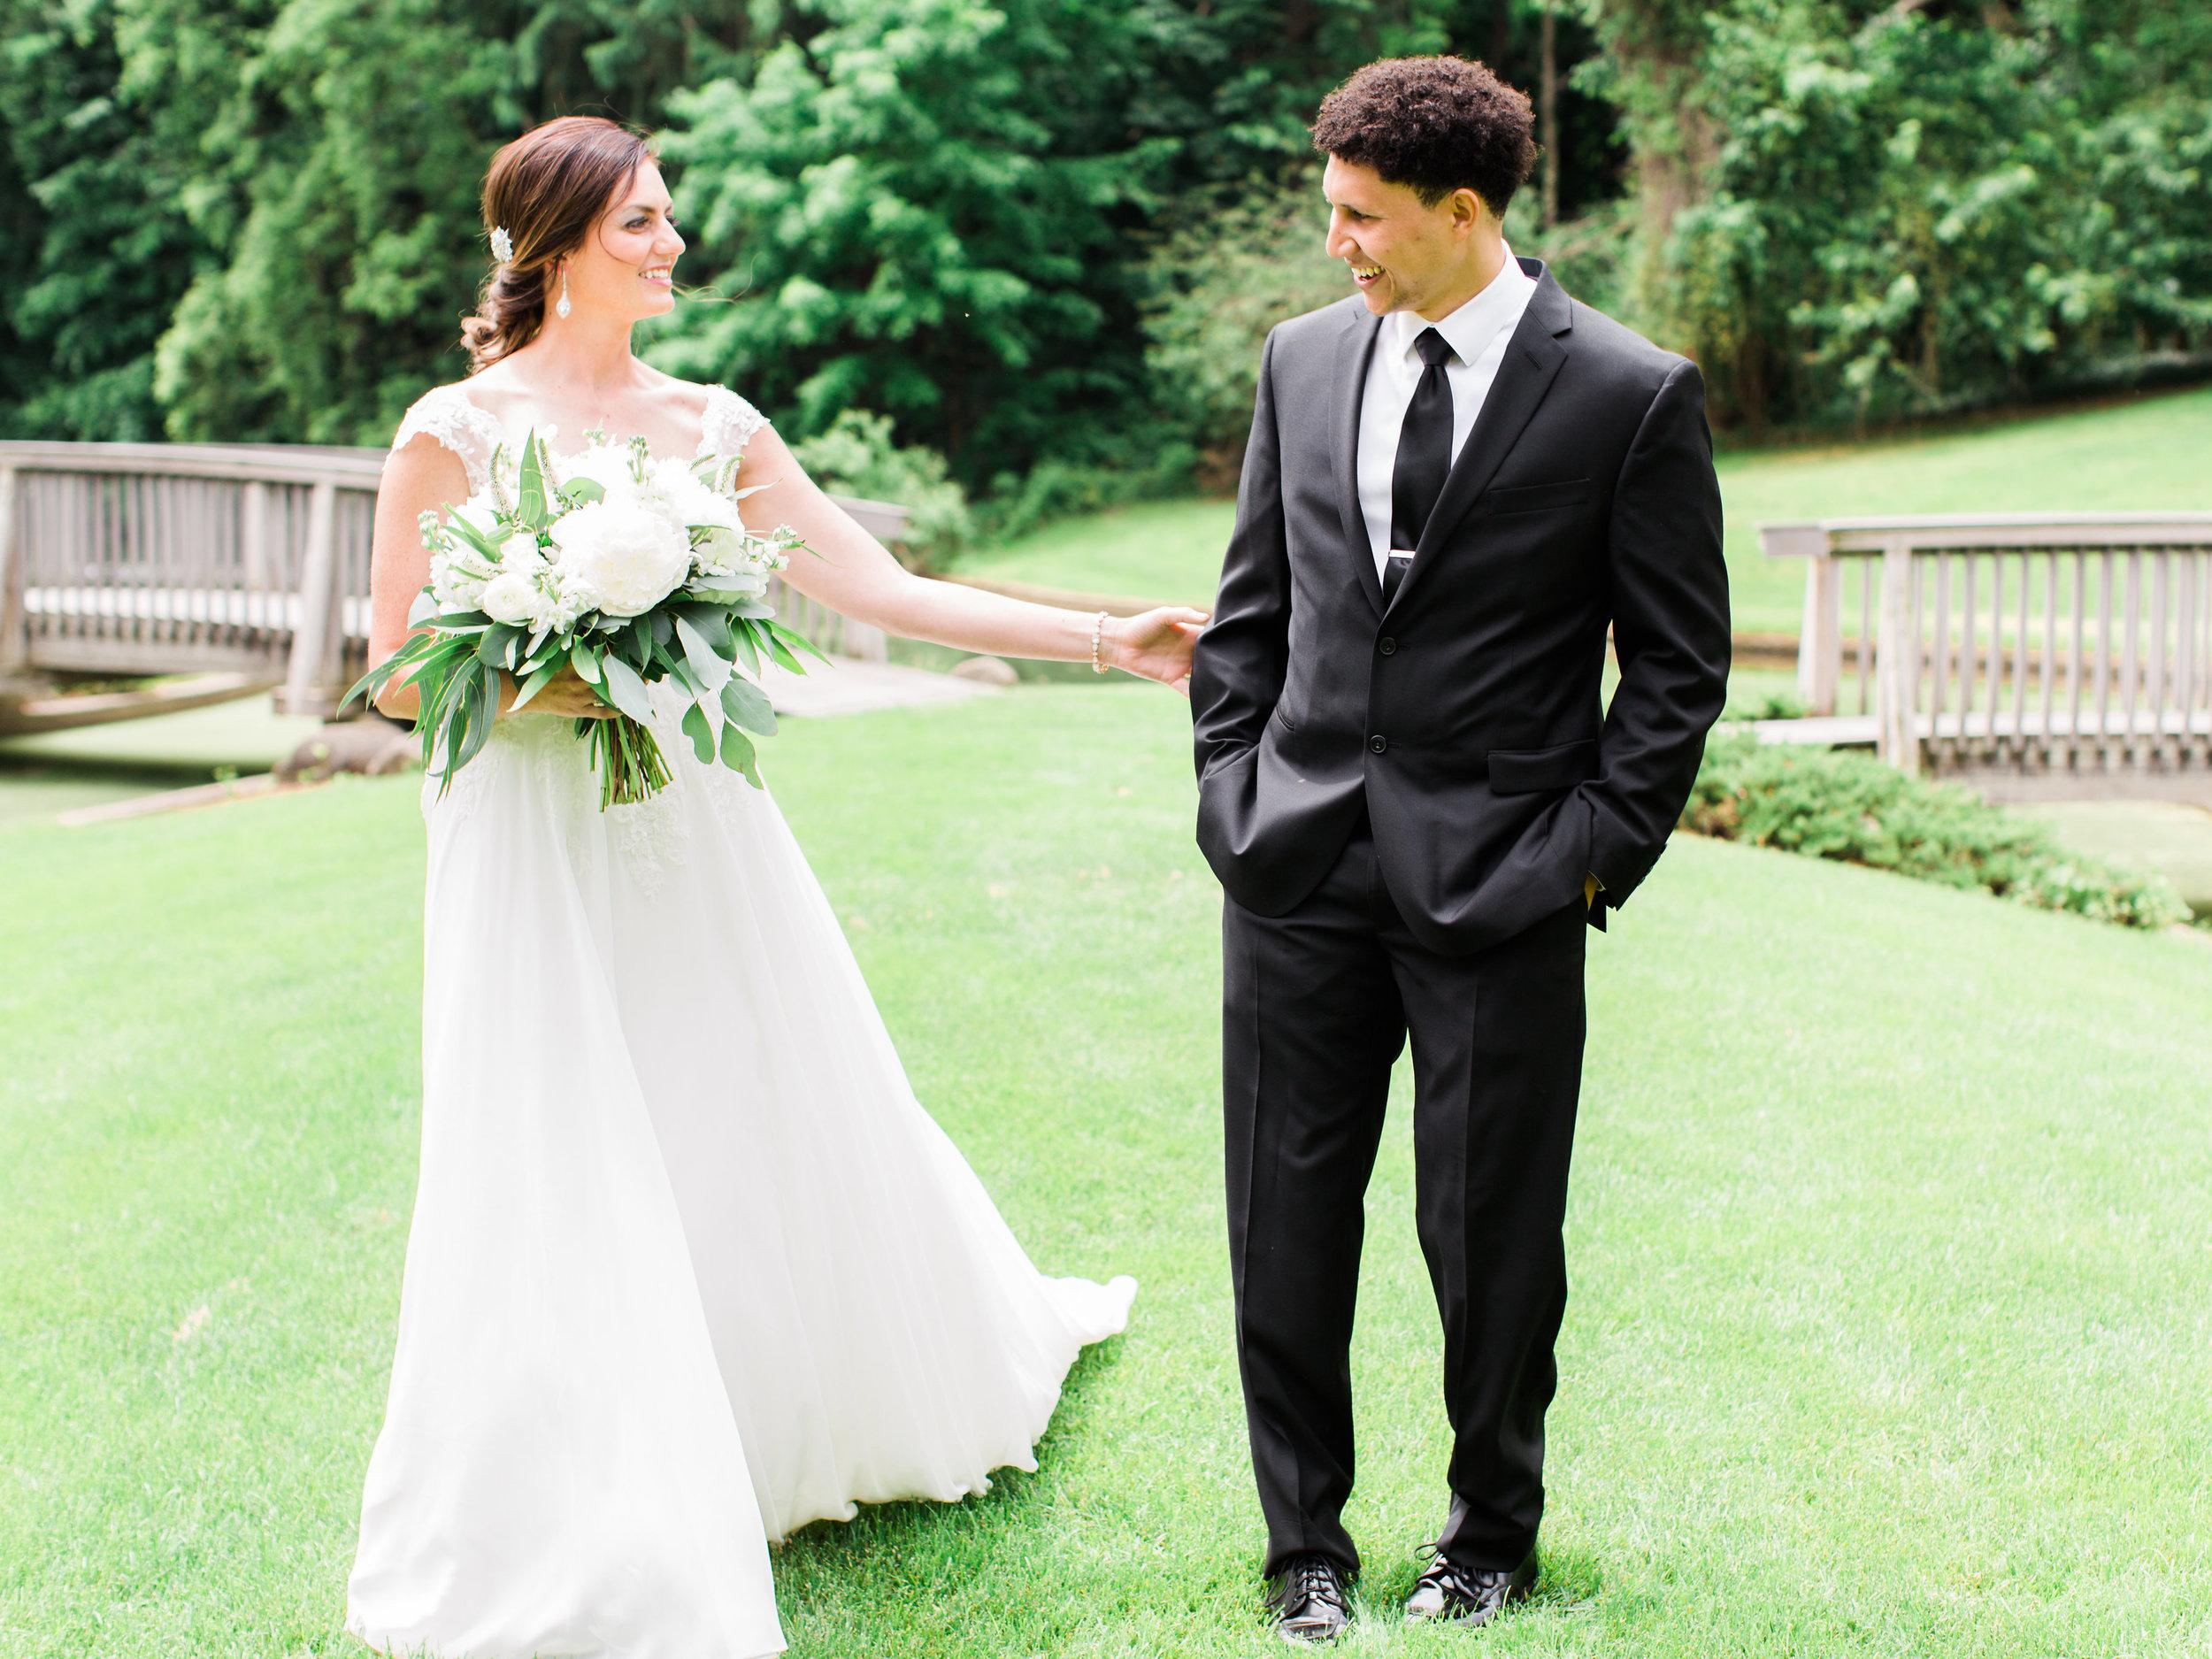 Julius+Wedding+FirstLook-7.jpg